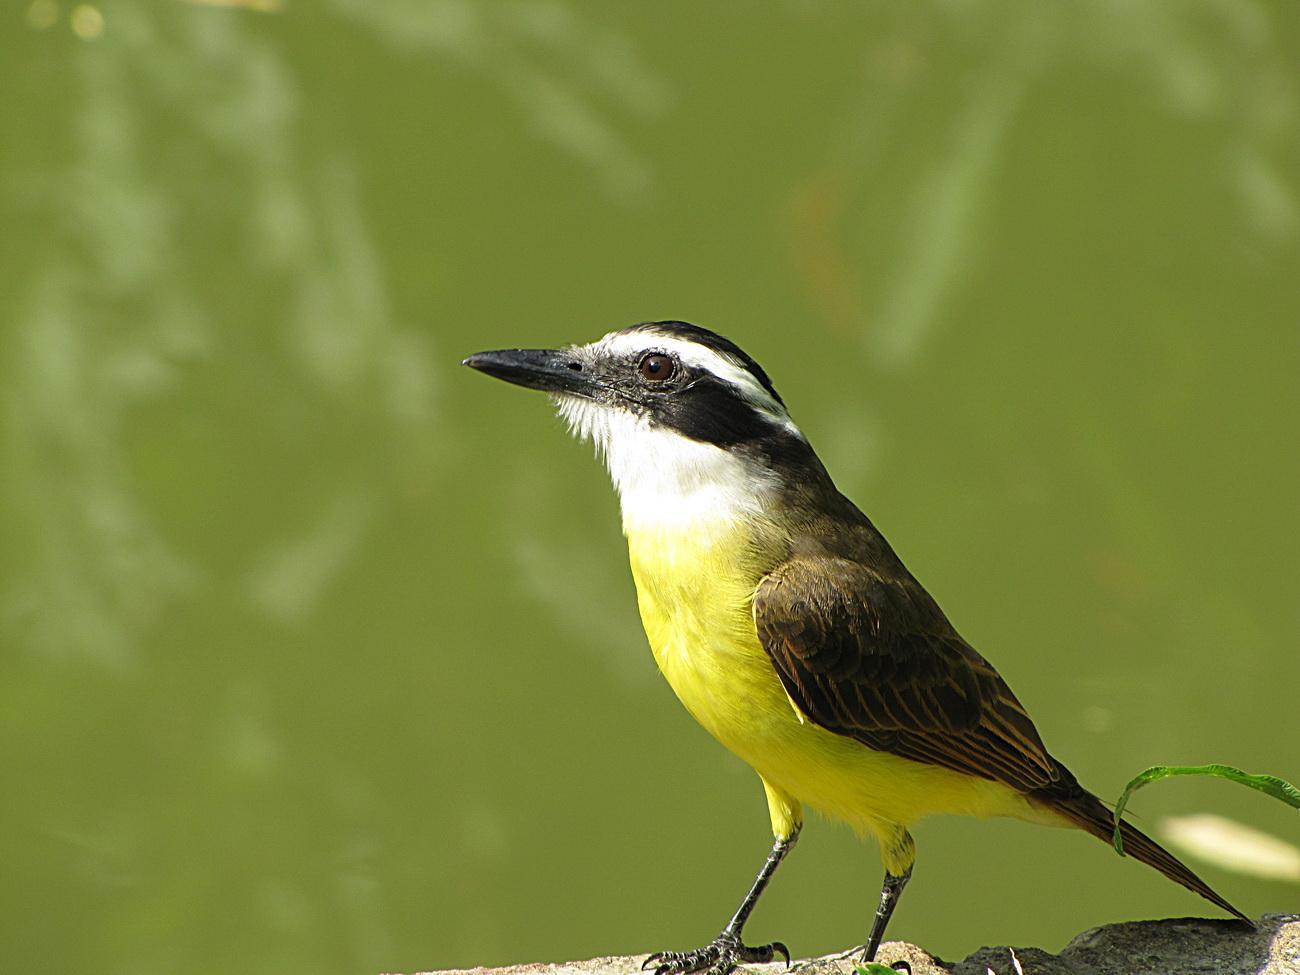 bentevi (1), bird (1), general (1), nature (1): www.socwall.com/desktop-wallpaper/18184/bentevi-by-jota-moraes